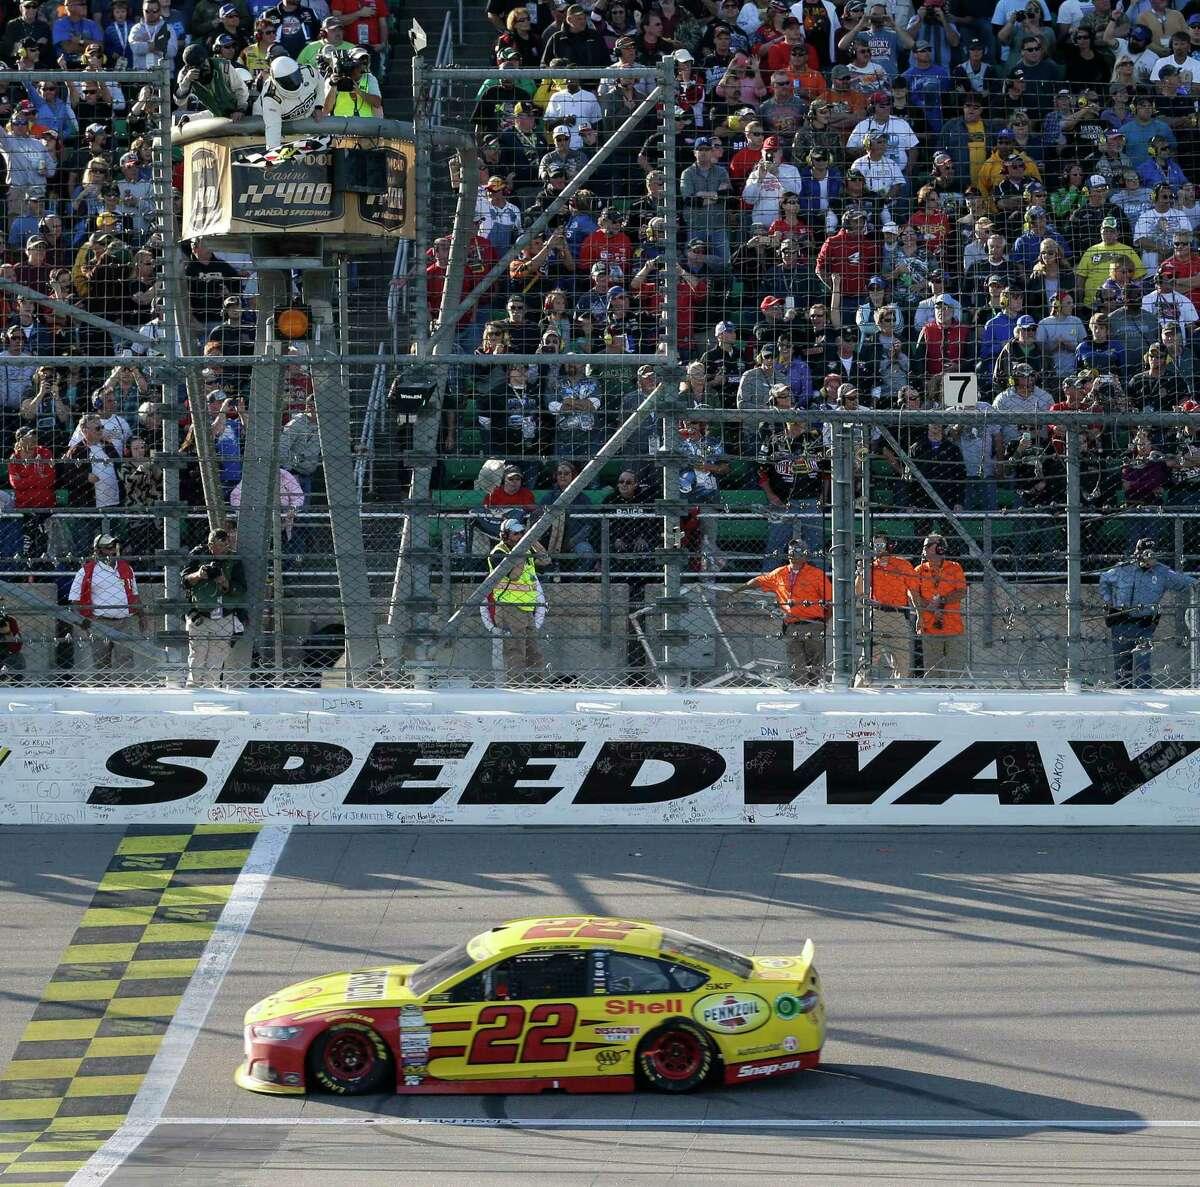 Joey Logano takes the checkered flag to win at Kansas Speedway in Kansas City, Kan., on Sunday.